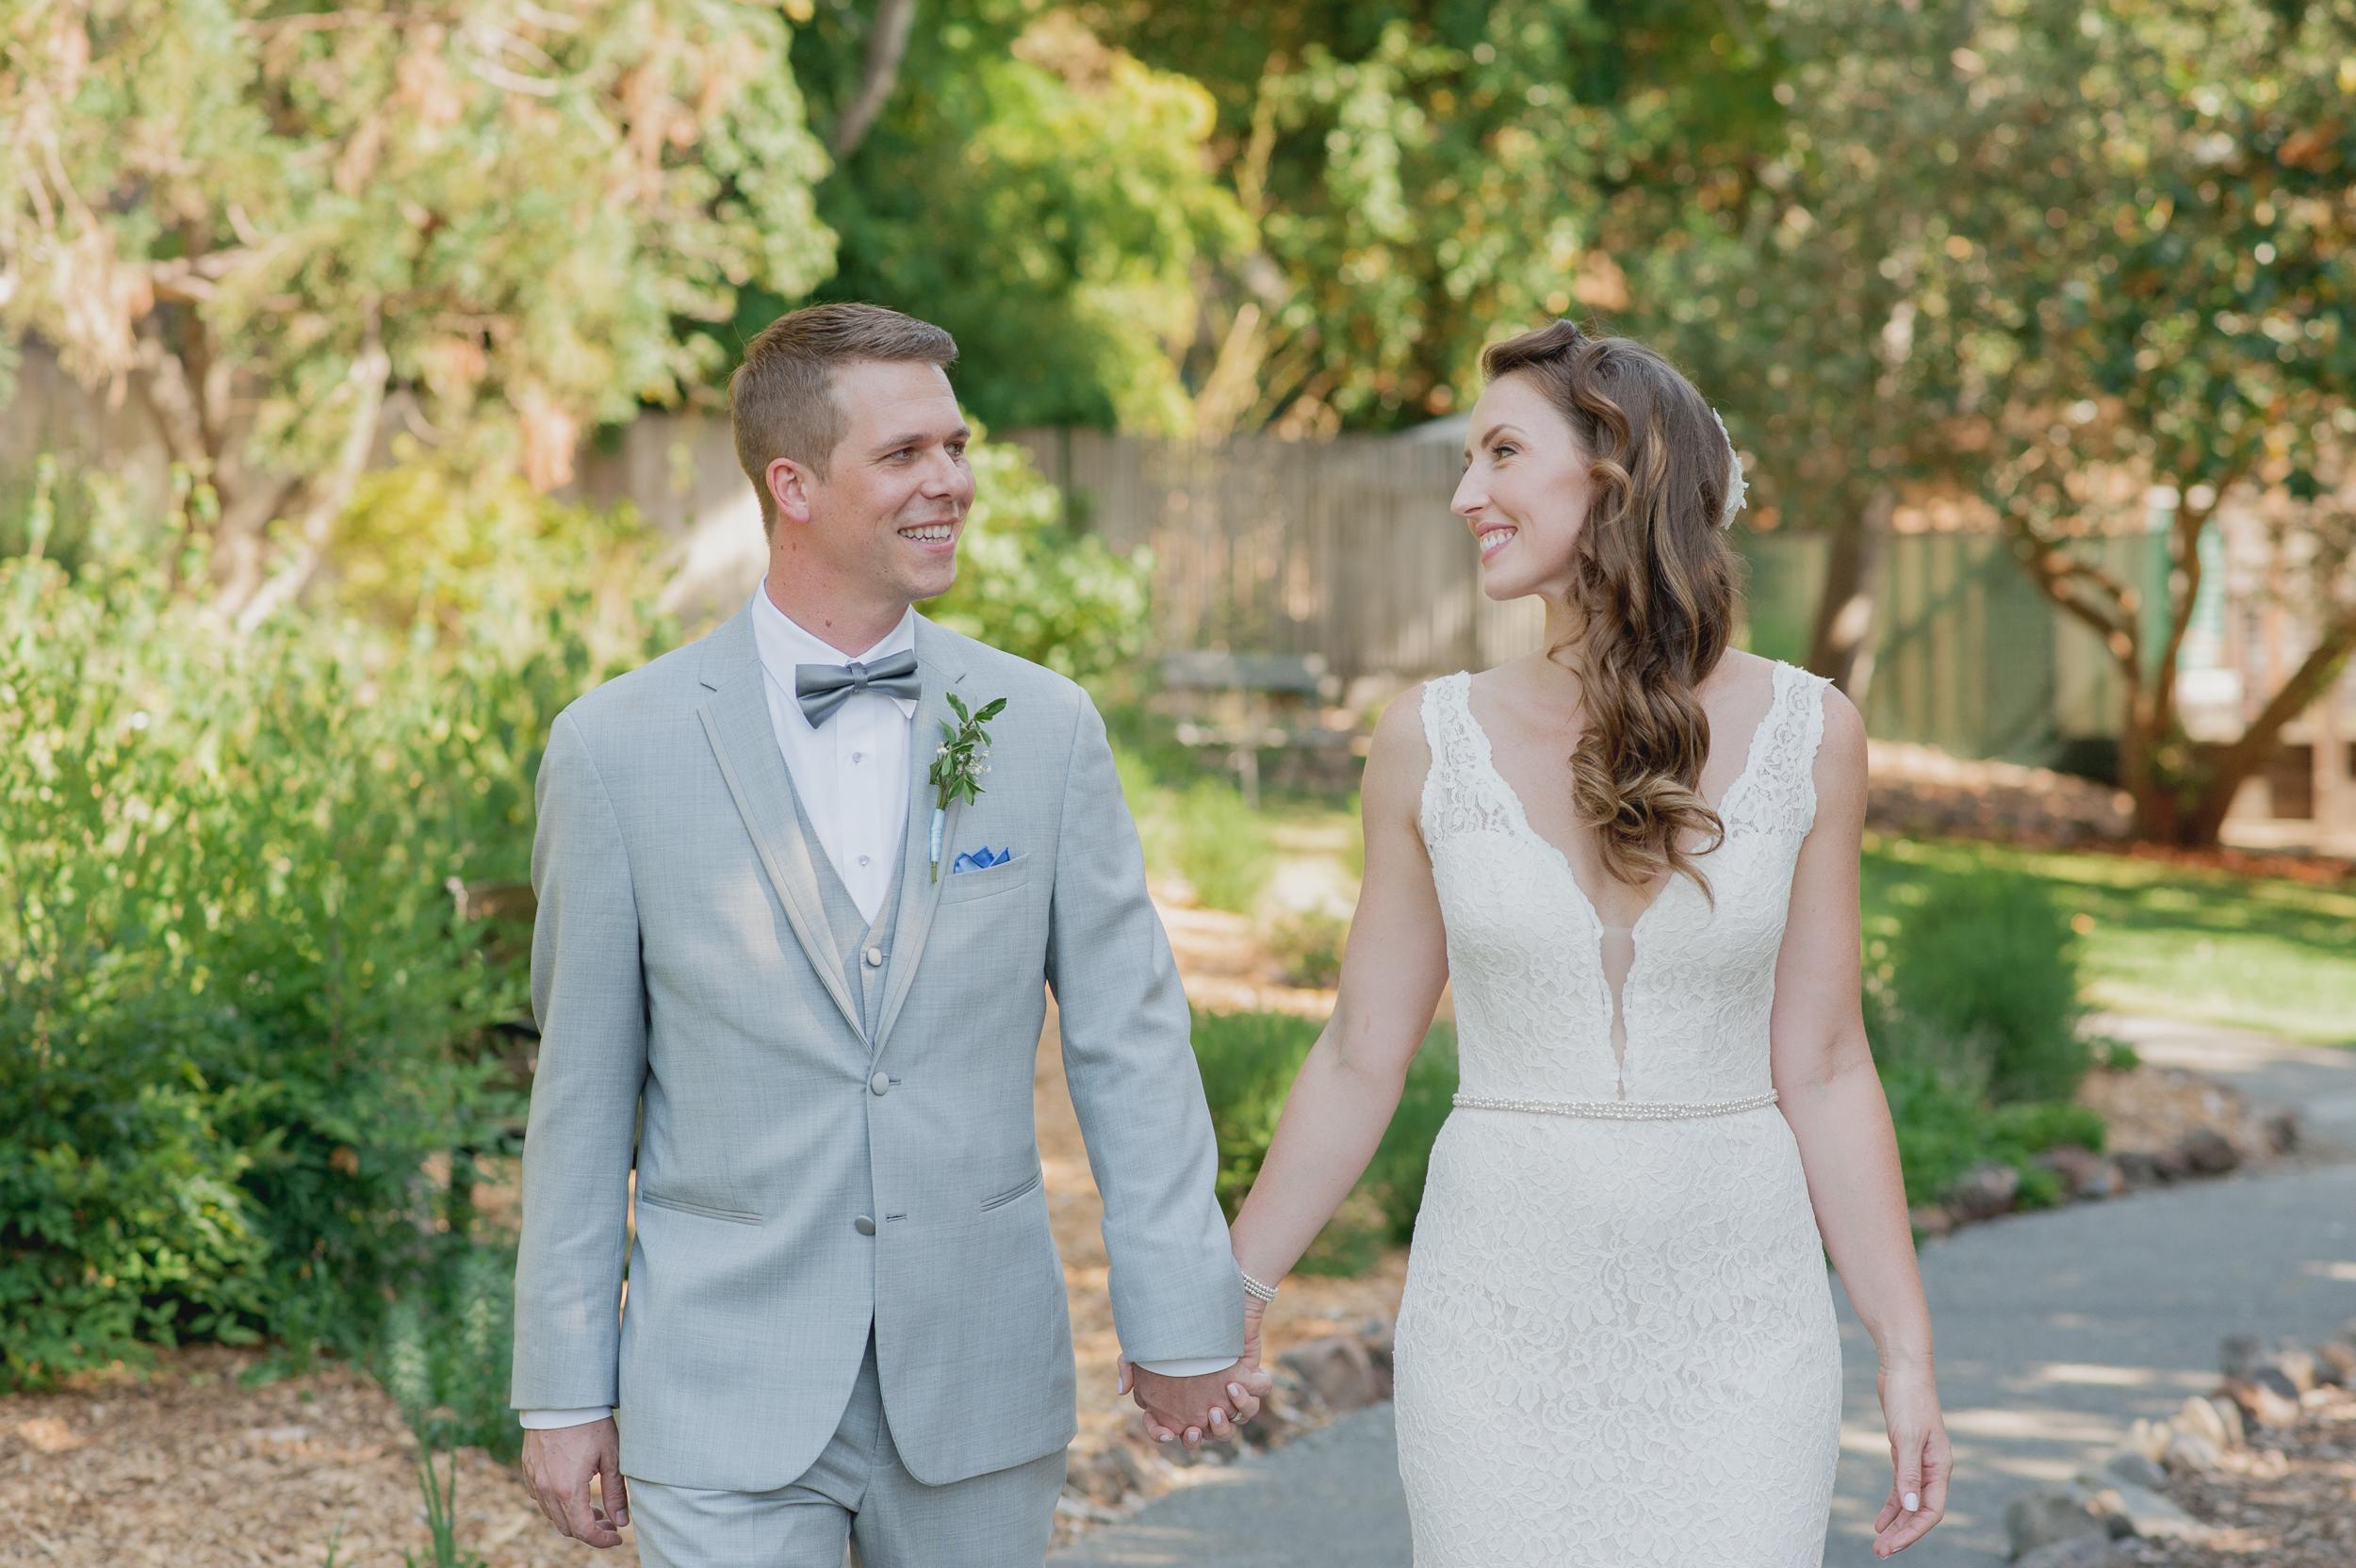 16-down-to-earth-marin-art-garden-center-wedding-vivianchen.jpg